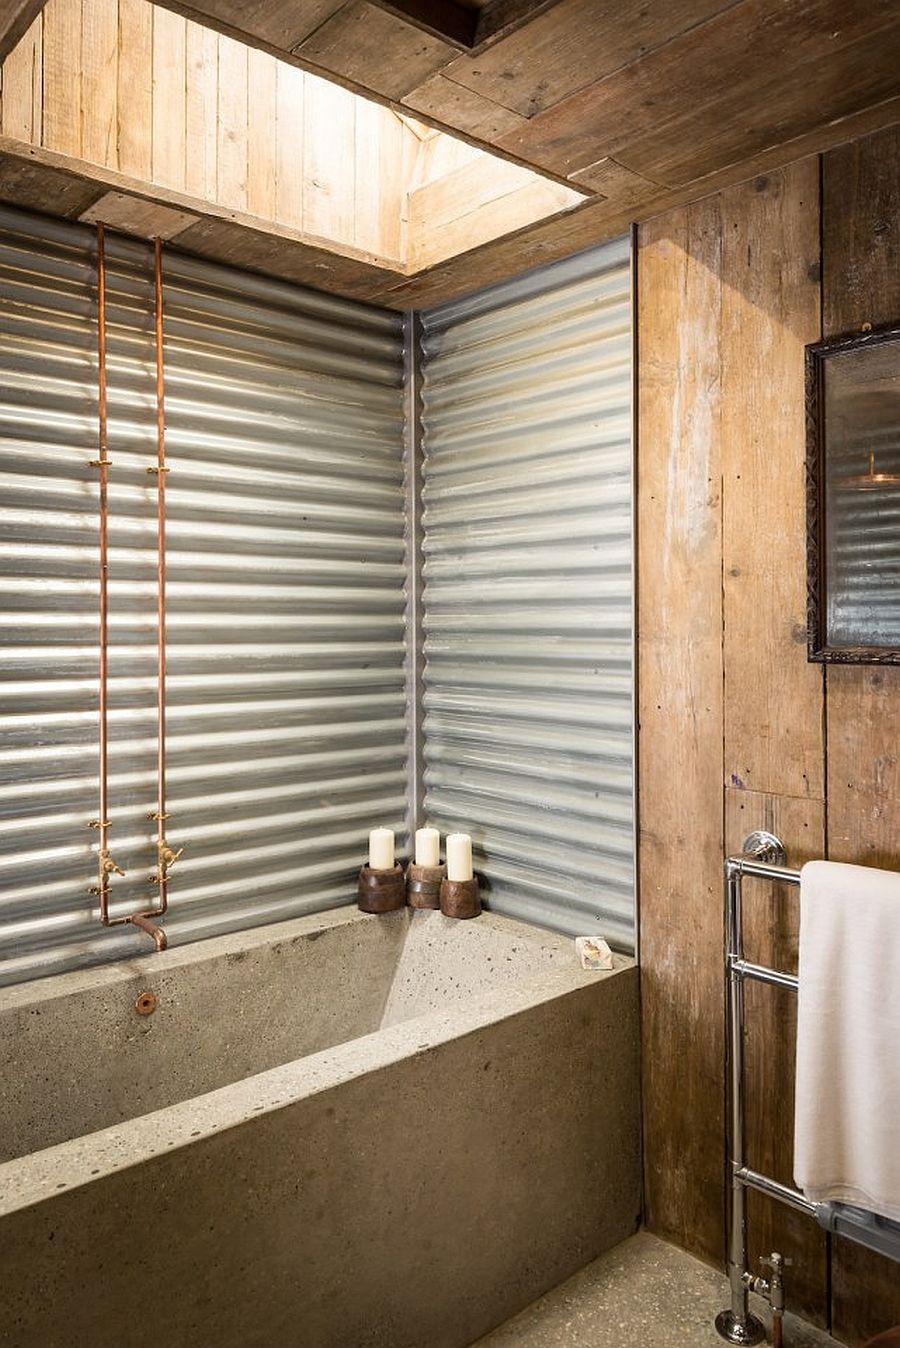 adelaparvu.com despre cabana rustica si tuse industriale, Firefly Cabin, Cornwall, Anglia, Foto Unique Home Stays (3)